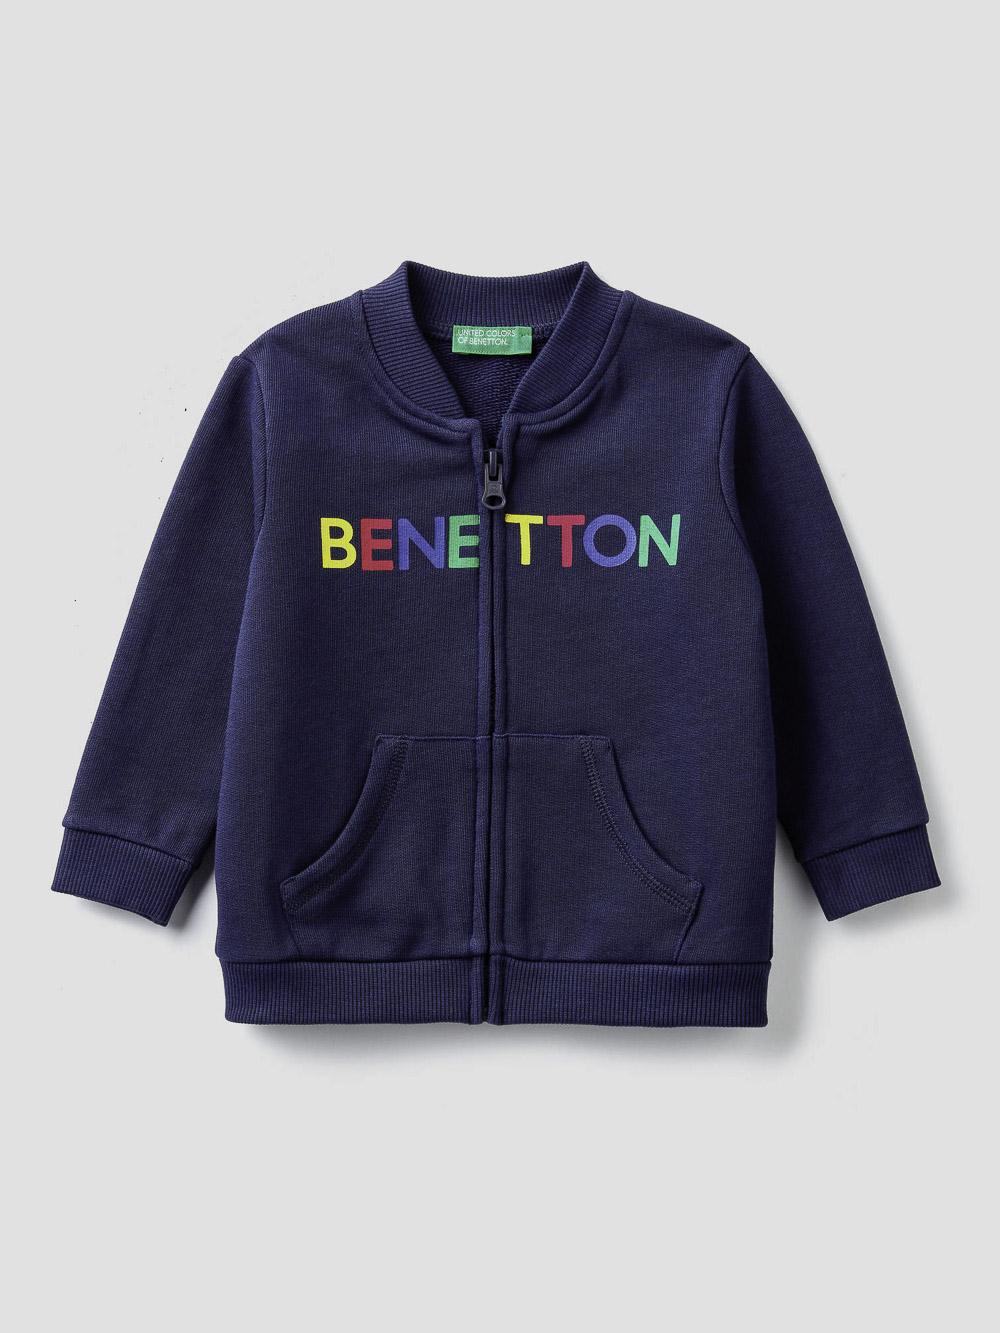 012 BENETTON Ζακέτα φούτερ με φερμουάρ και λογότυπο 3J70C5836 20A252